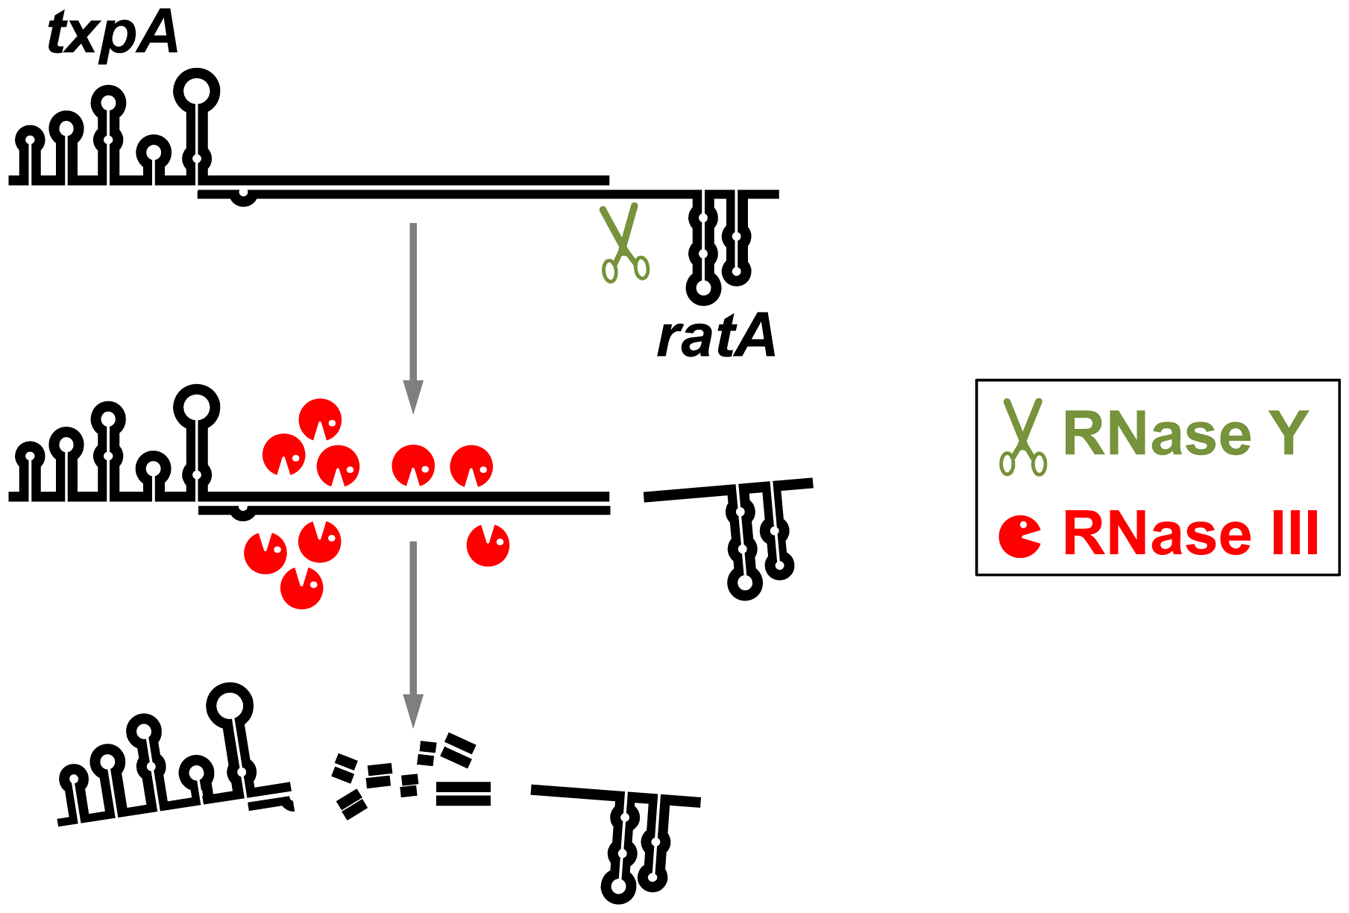 Degradation of a phage-encoded toxin mRNA in <i>B. subtilis</i>.